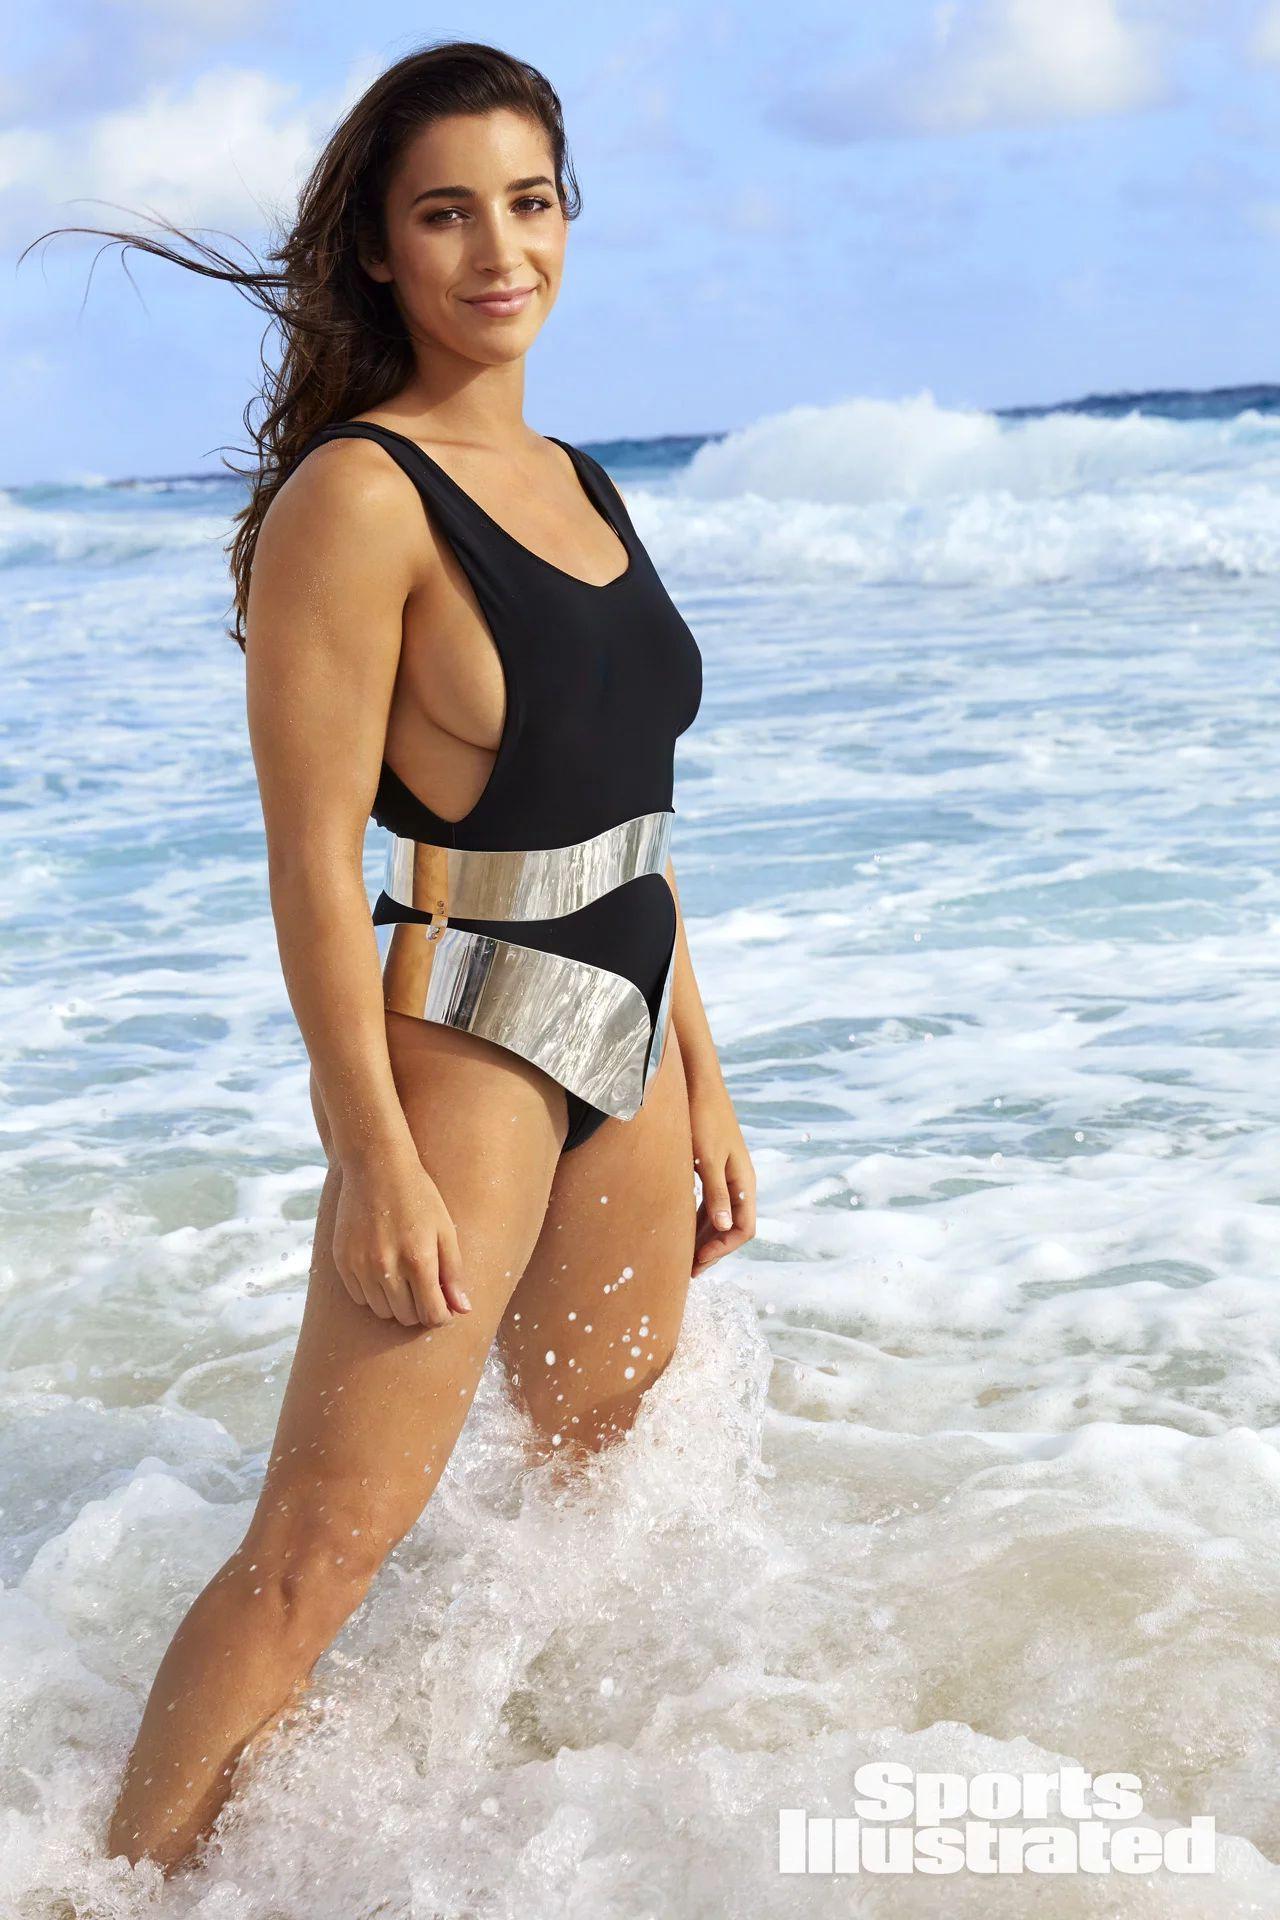 Aly Raisman Si Swimsuit Issue 2018